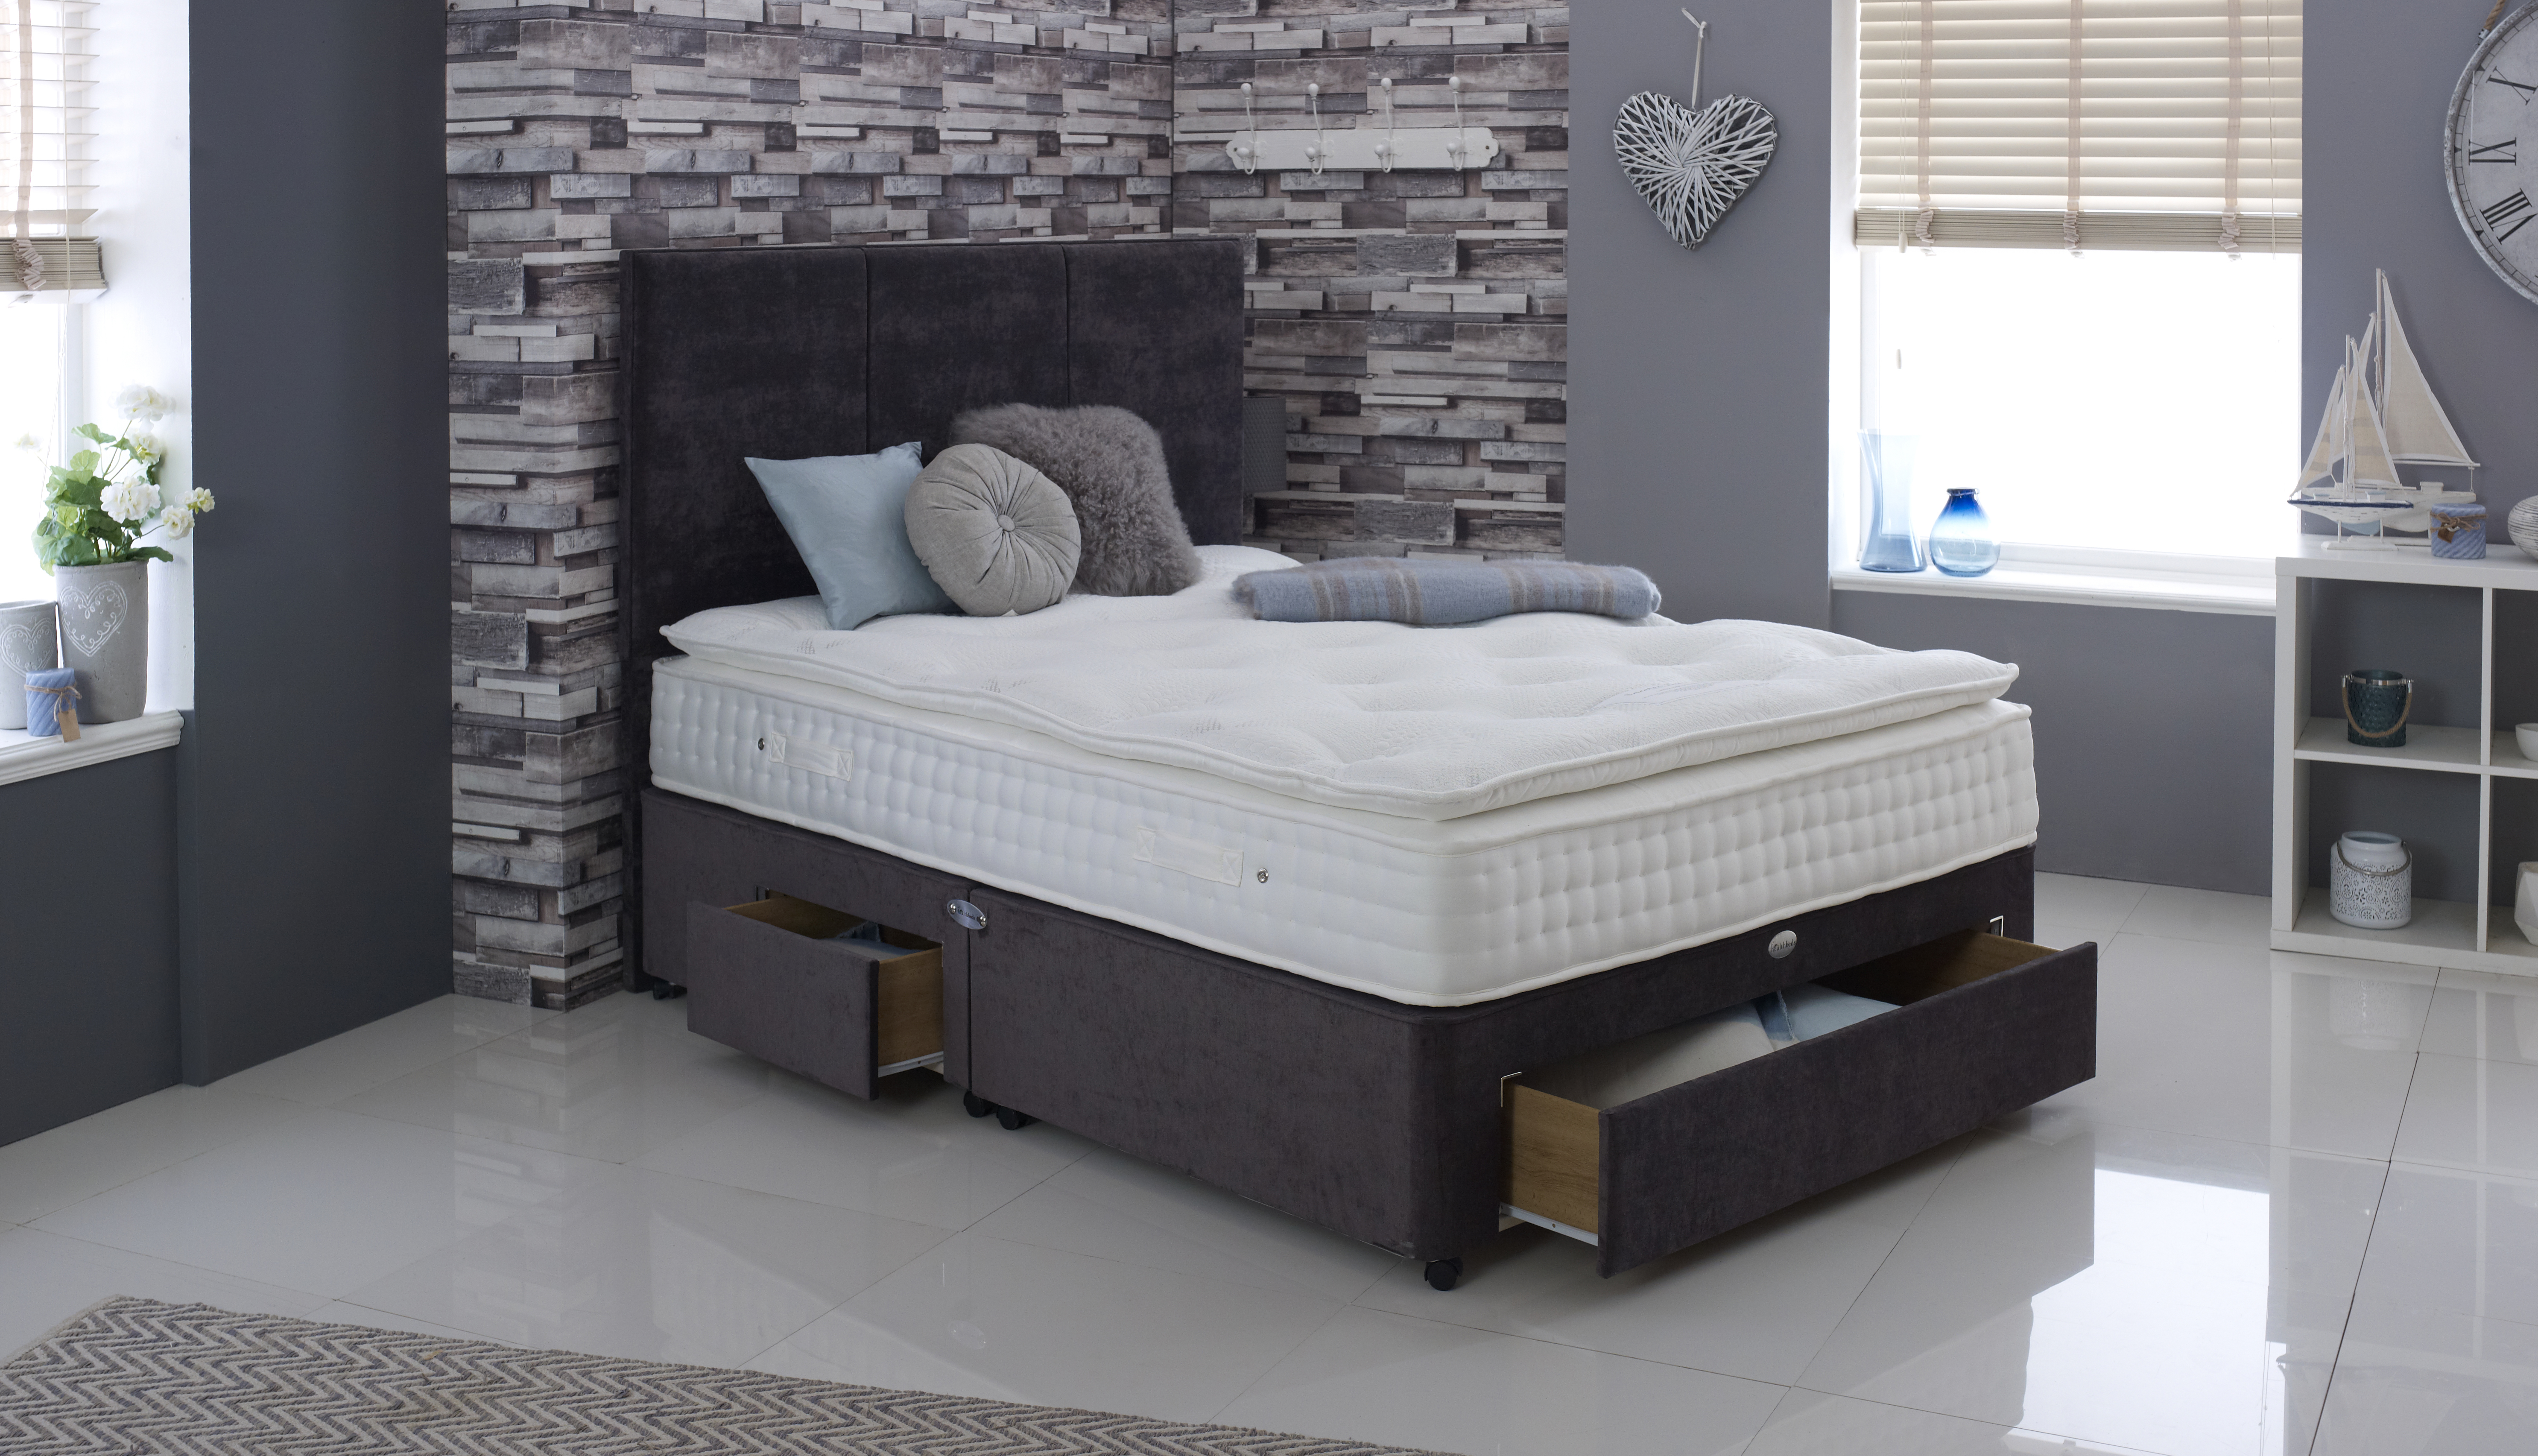 Smeaton 1200 Pillow top